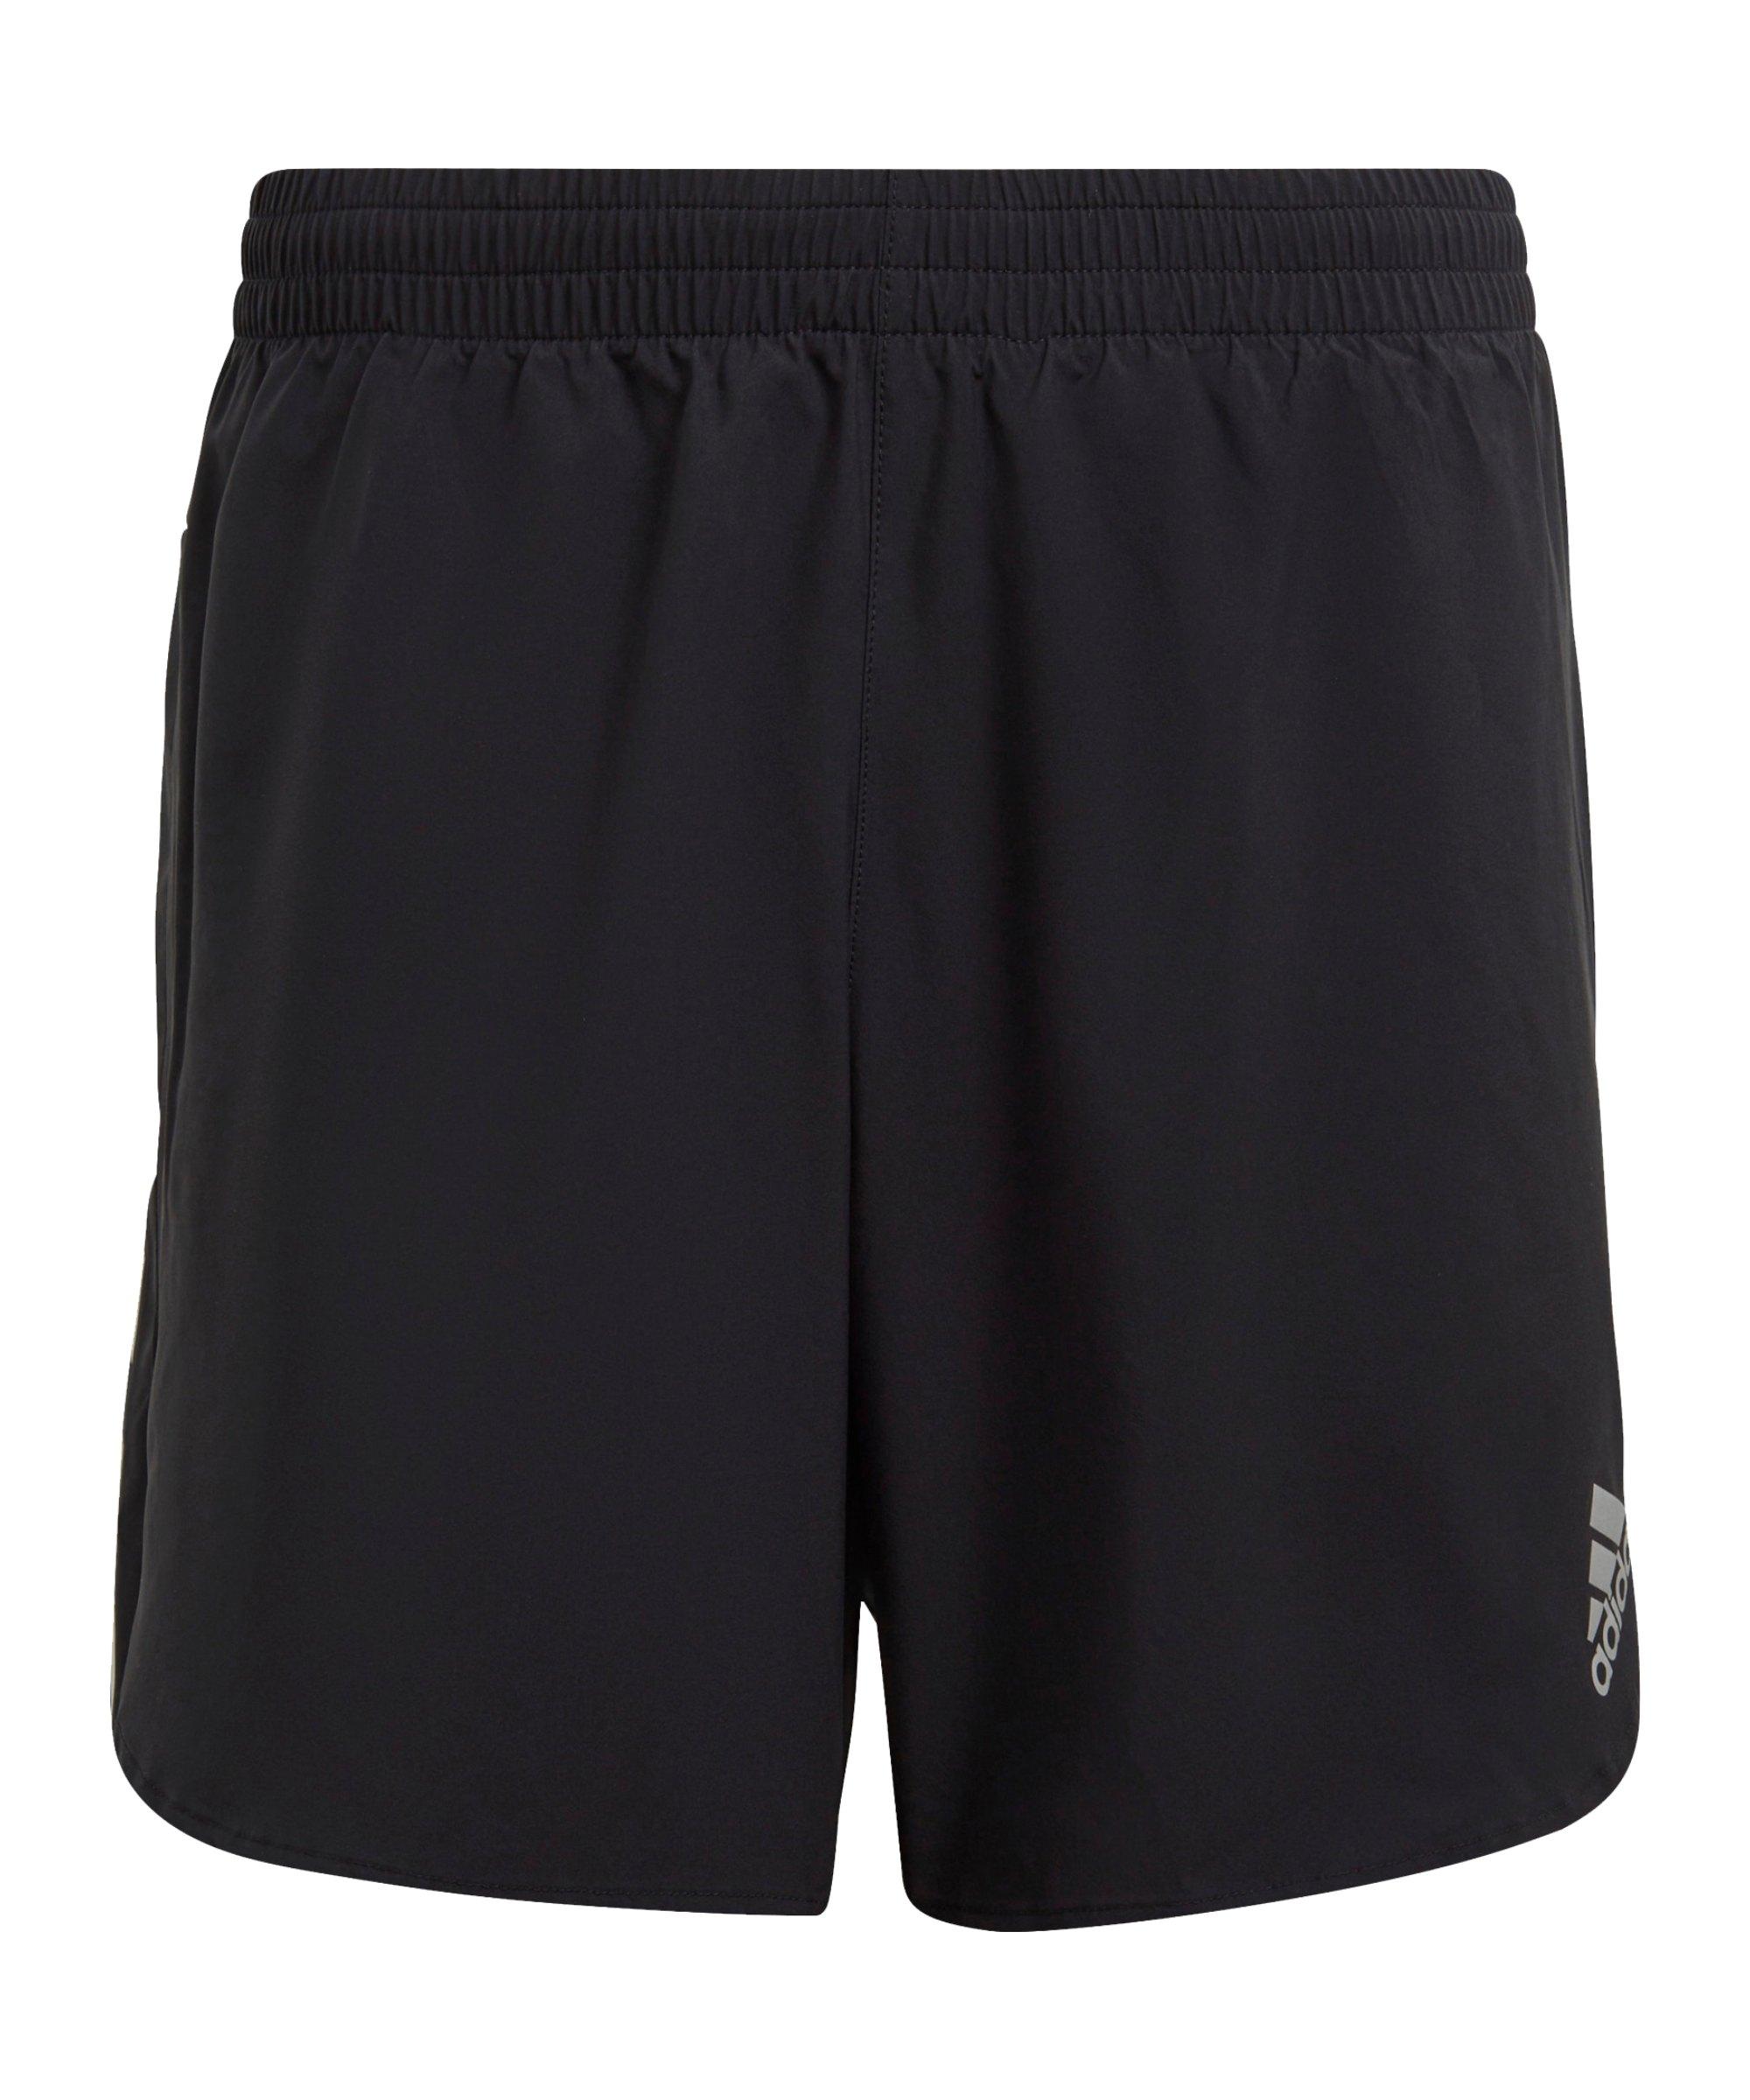 adidas Primblue Short Running Schwarz - schwarz